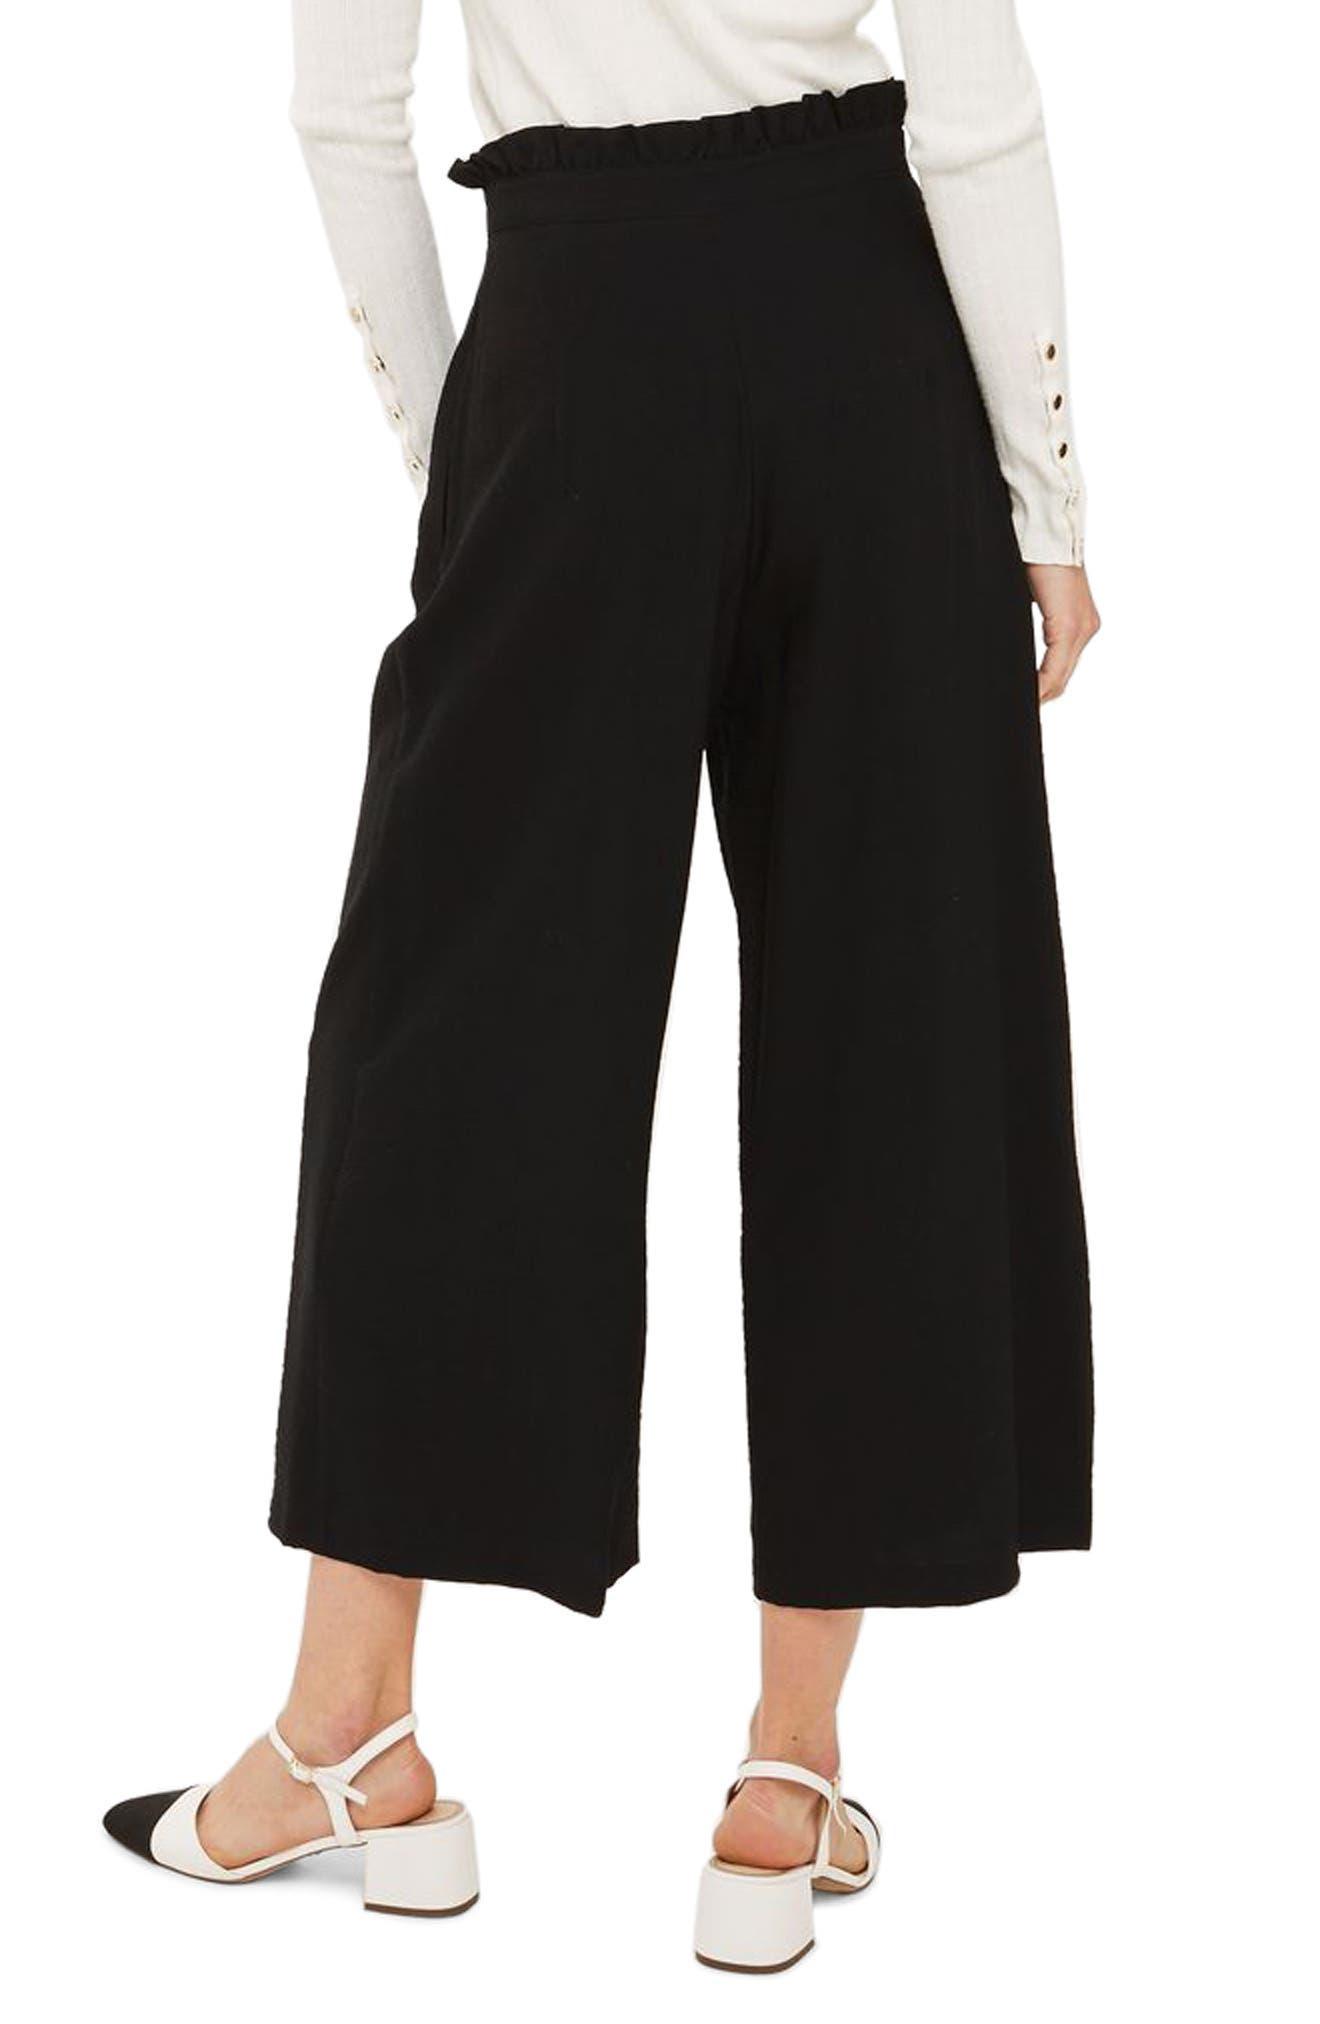 TOPSHOP, Ruffle Waist Trousers, Alternate thumbnail 2, color, 001